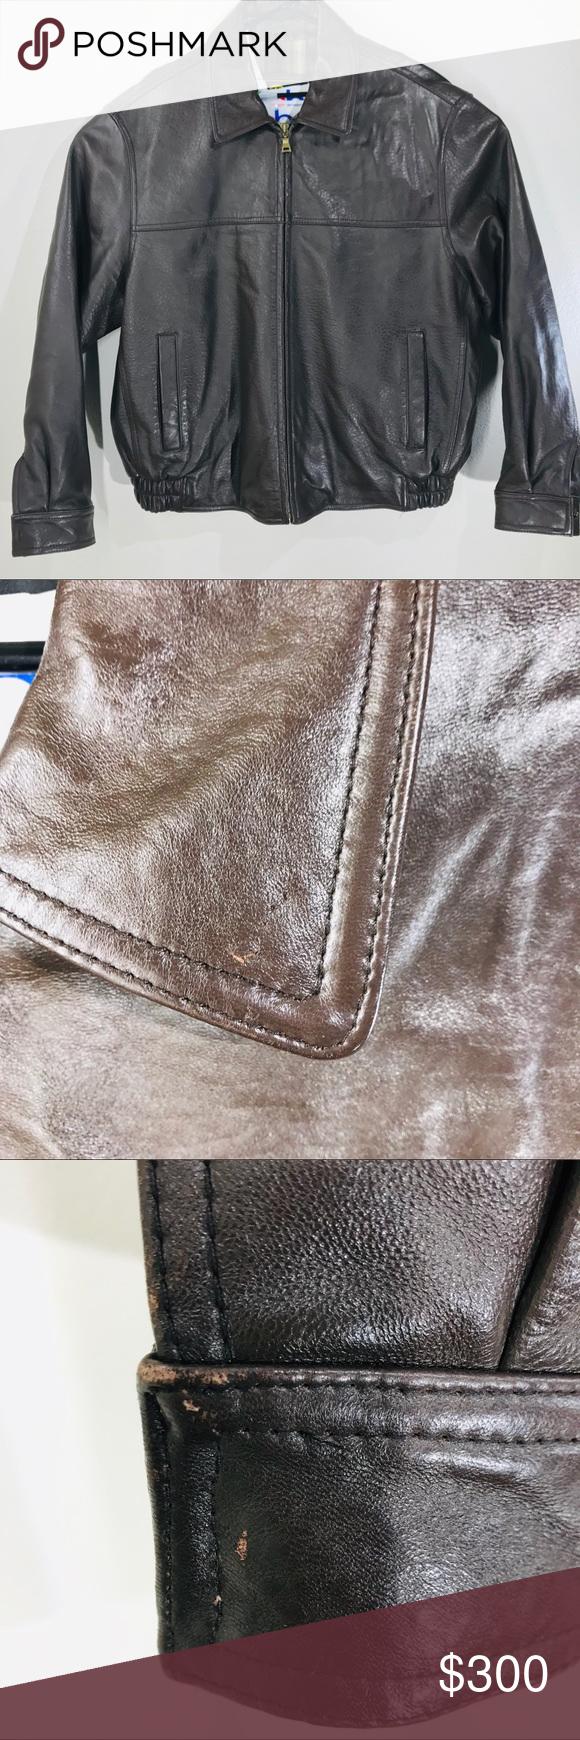 Reed Leather Men S Bomber Jacket Size Xl Leather Jacket Leather Jacket Men Fashion [ 1740 x 580 Pixel ]